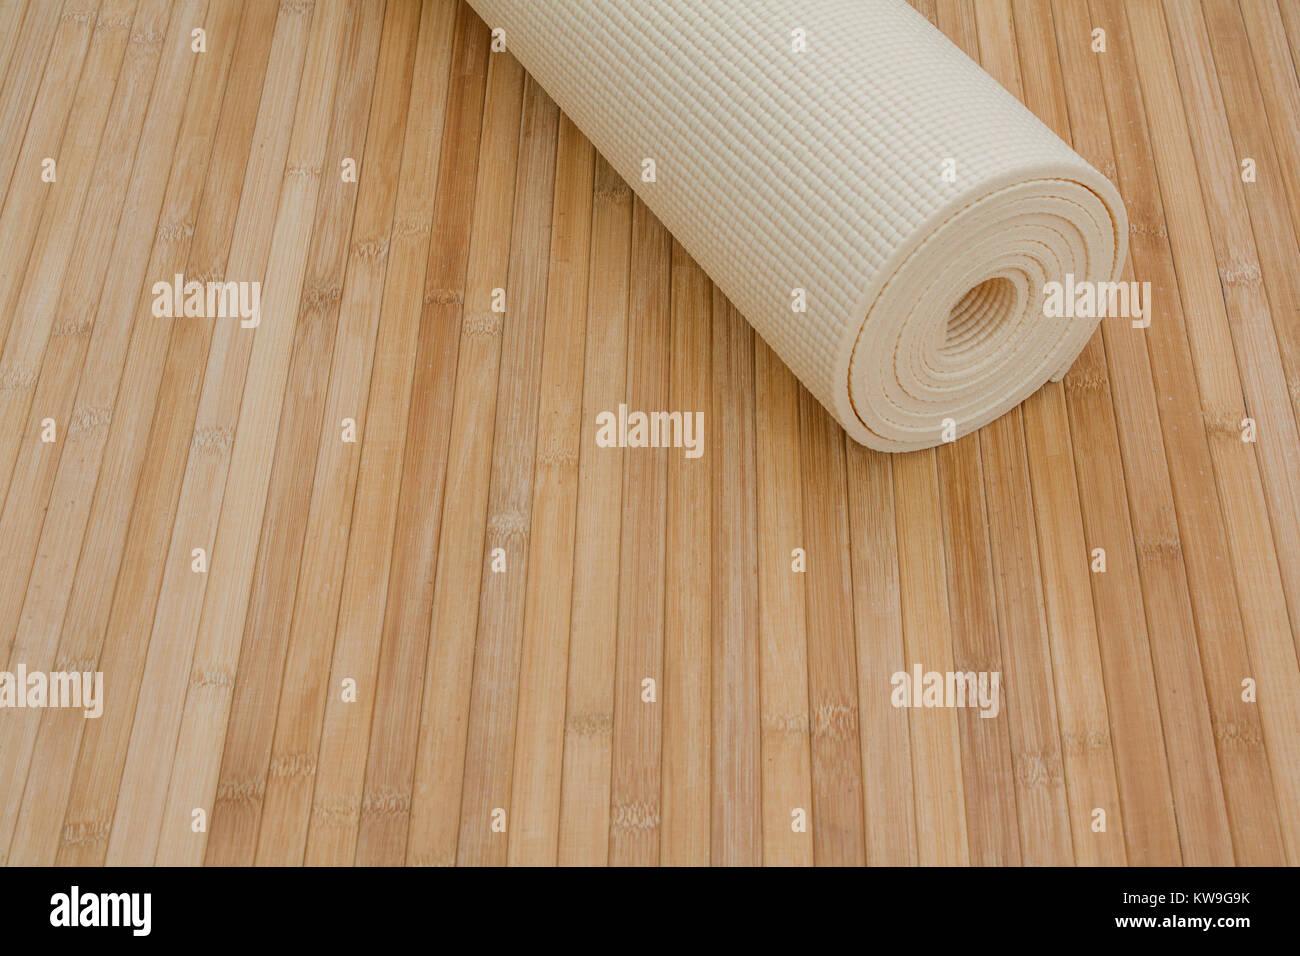 Yoga Class Supplies On Bamboo Mat Floor Ready For Yoga Retreat Stock